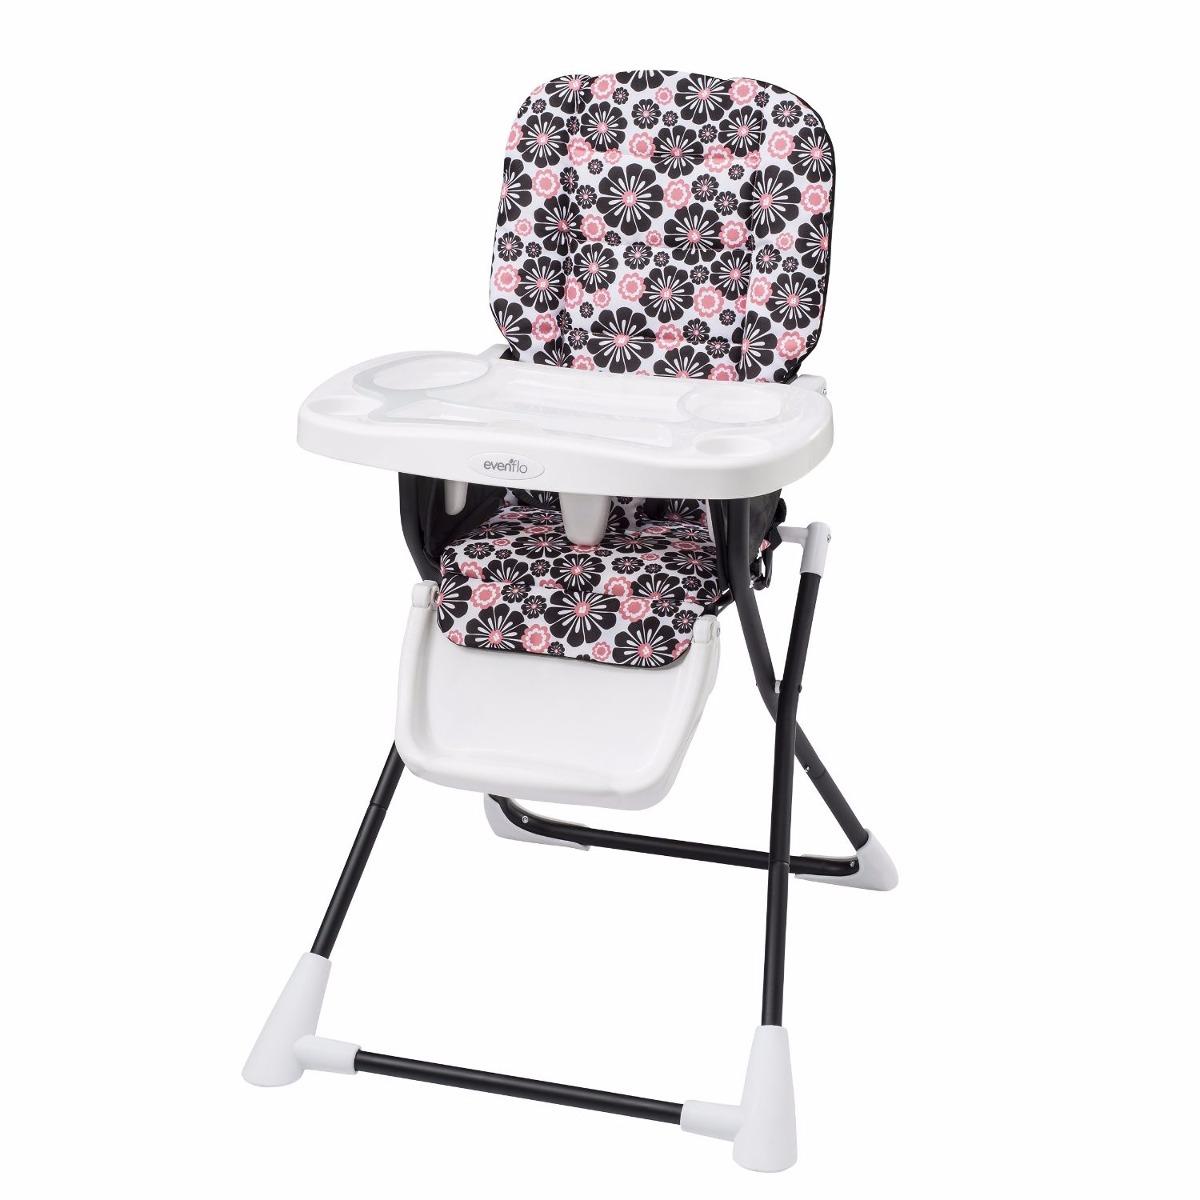 evenflo compact high chair french script paquete penelope portabebe carreola cuna silla